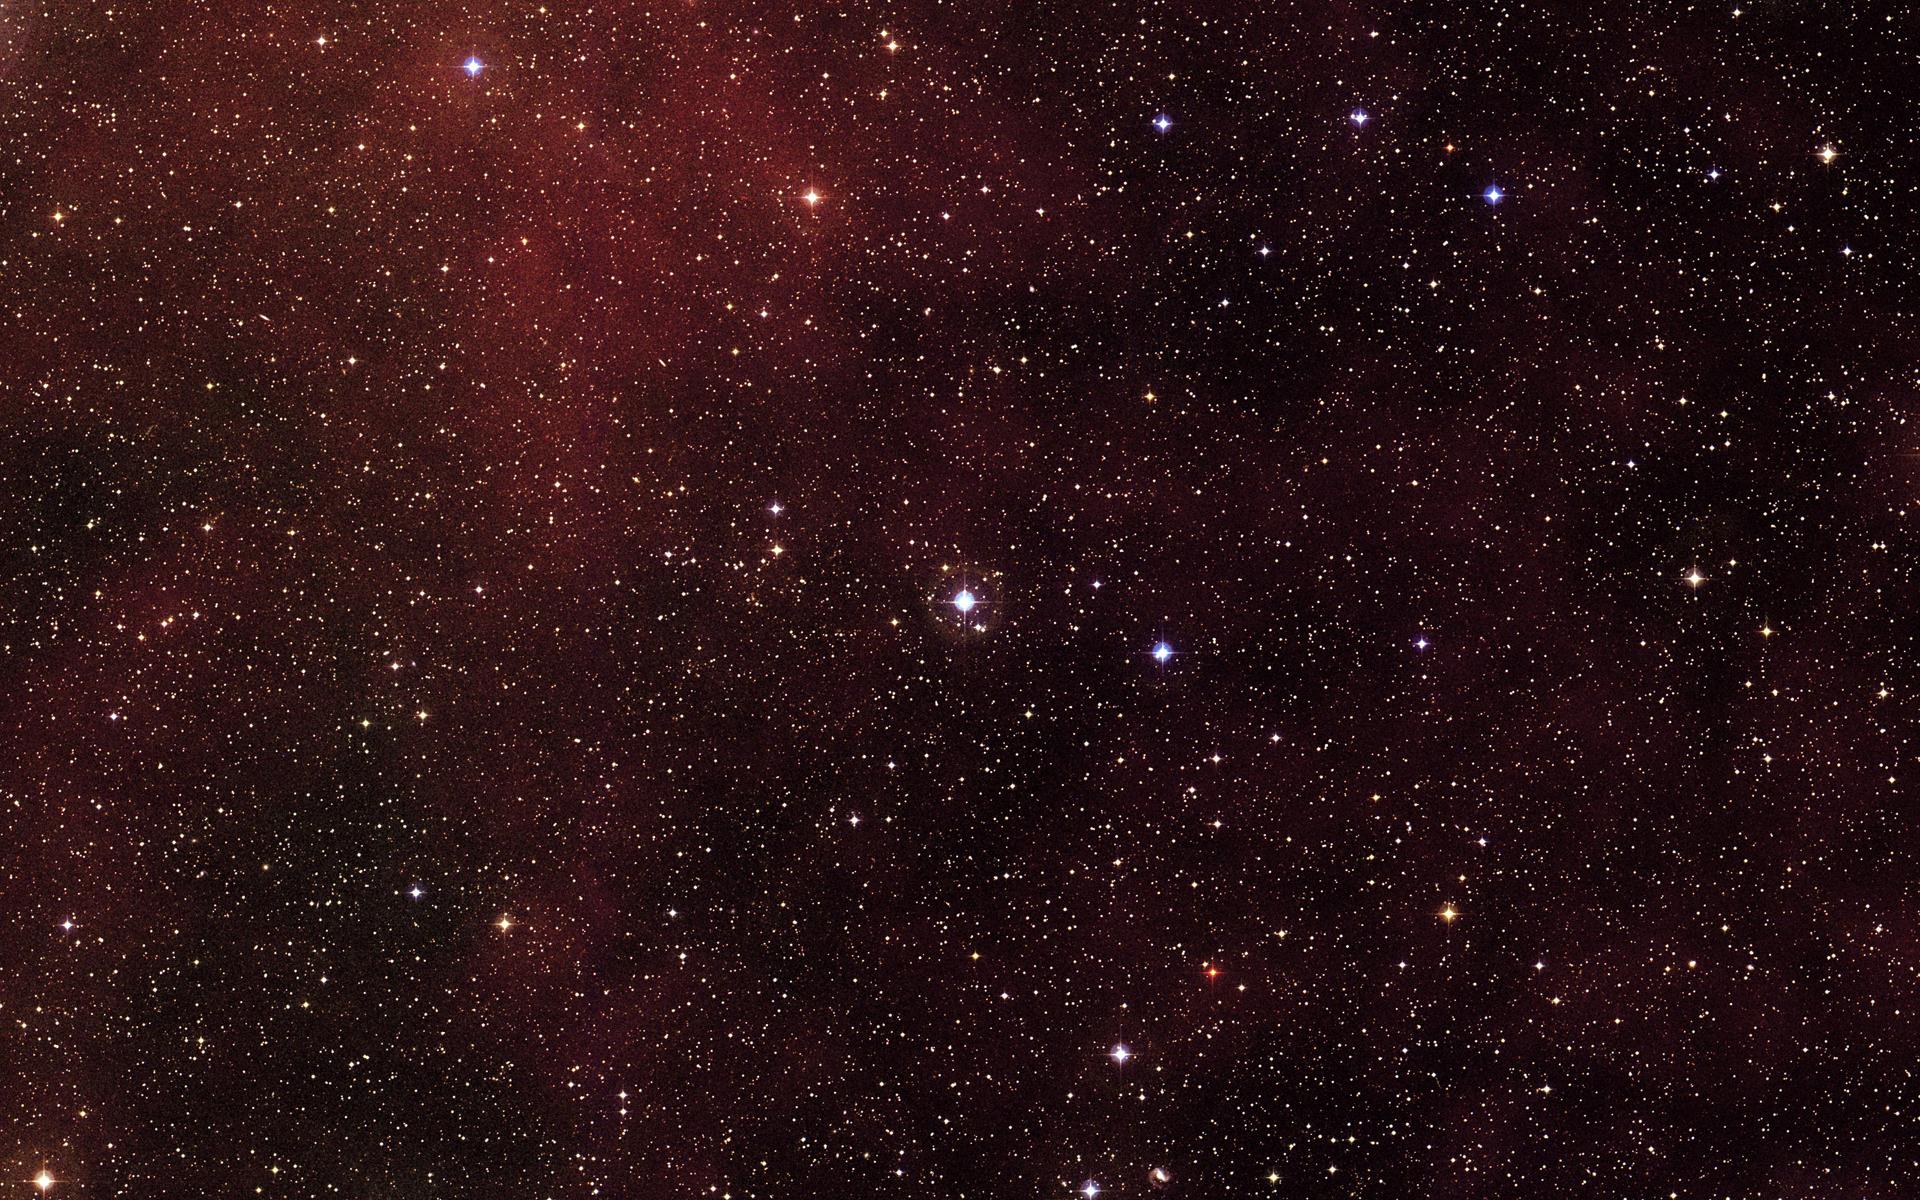 Hubble Telescope Wallpapers HQ 1920x1200